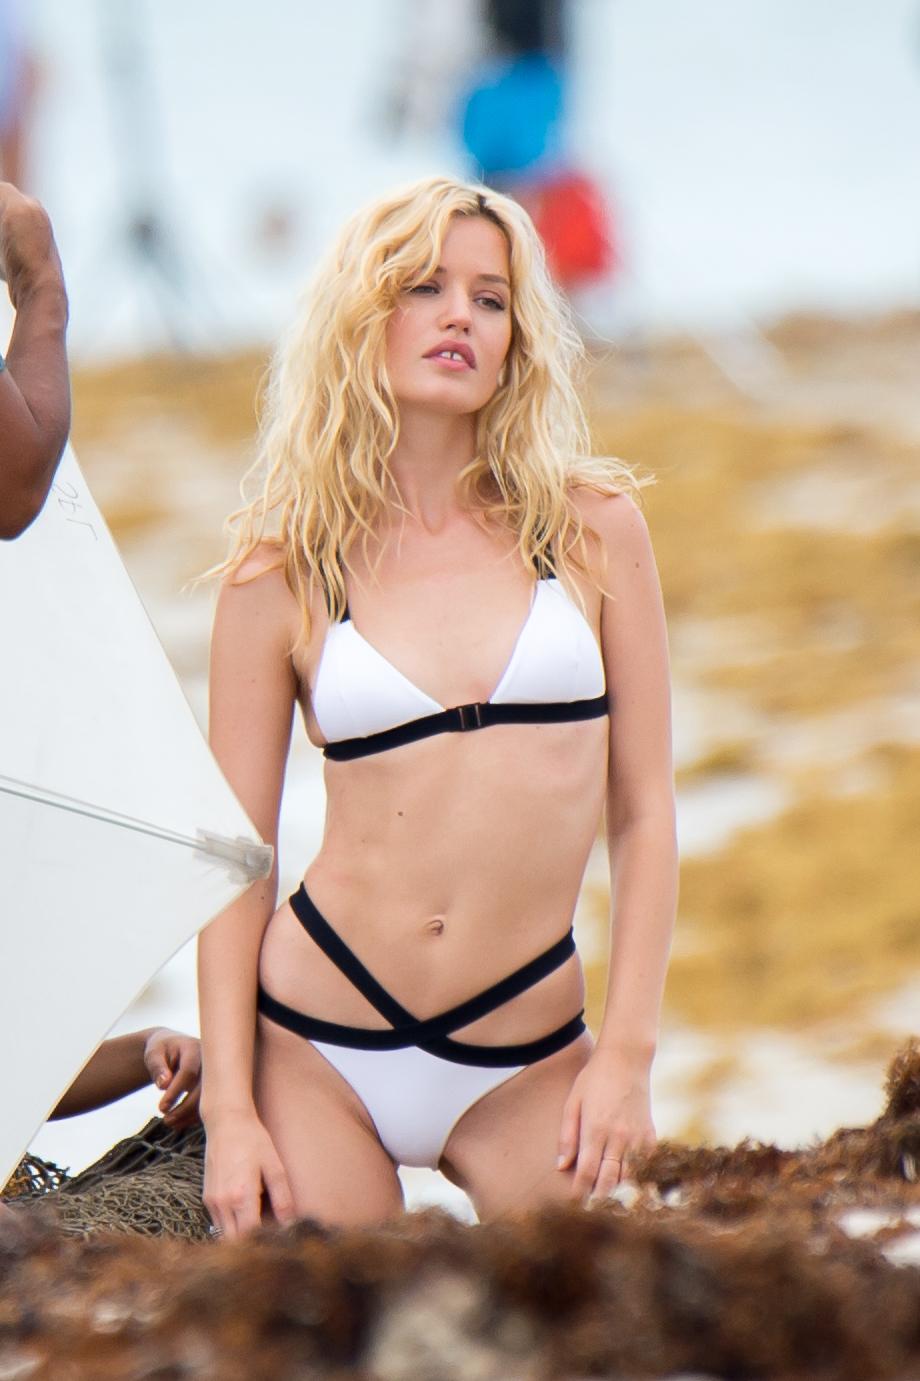 Christine sofie johansen naked,Any girl from birminghan Porn fotos Bella hadid topless photos 2,Blanca blanco pics 2